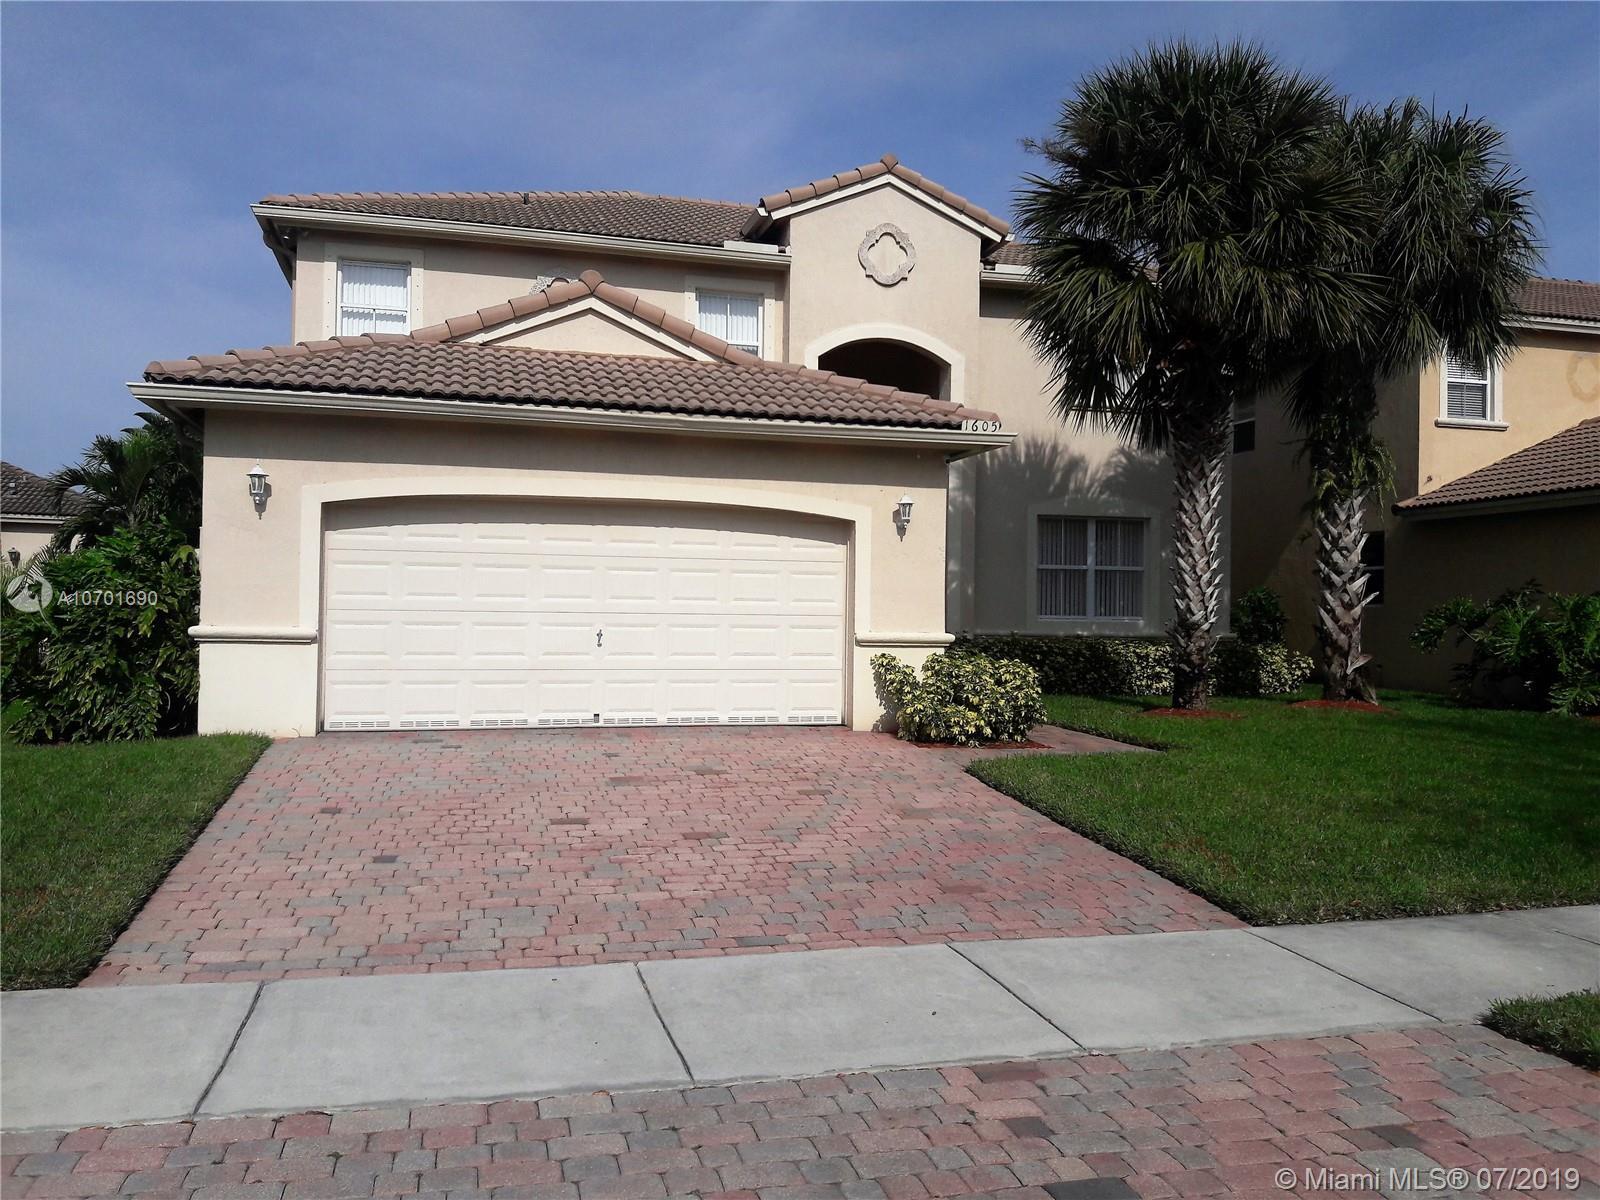 1605 SE 16th St, Homestead, FL 33035 - Homestead, FL real estate listing